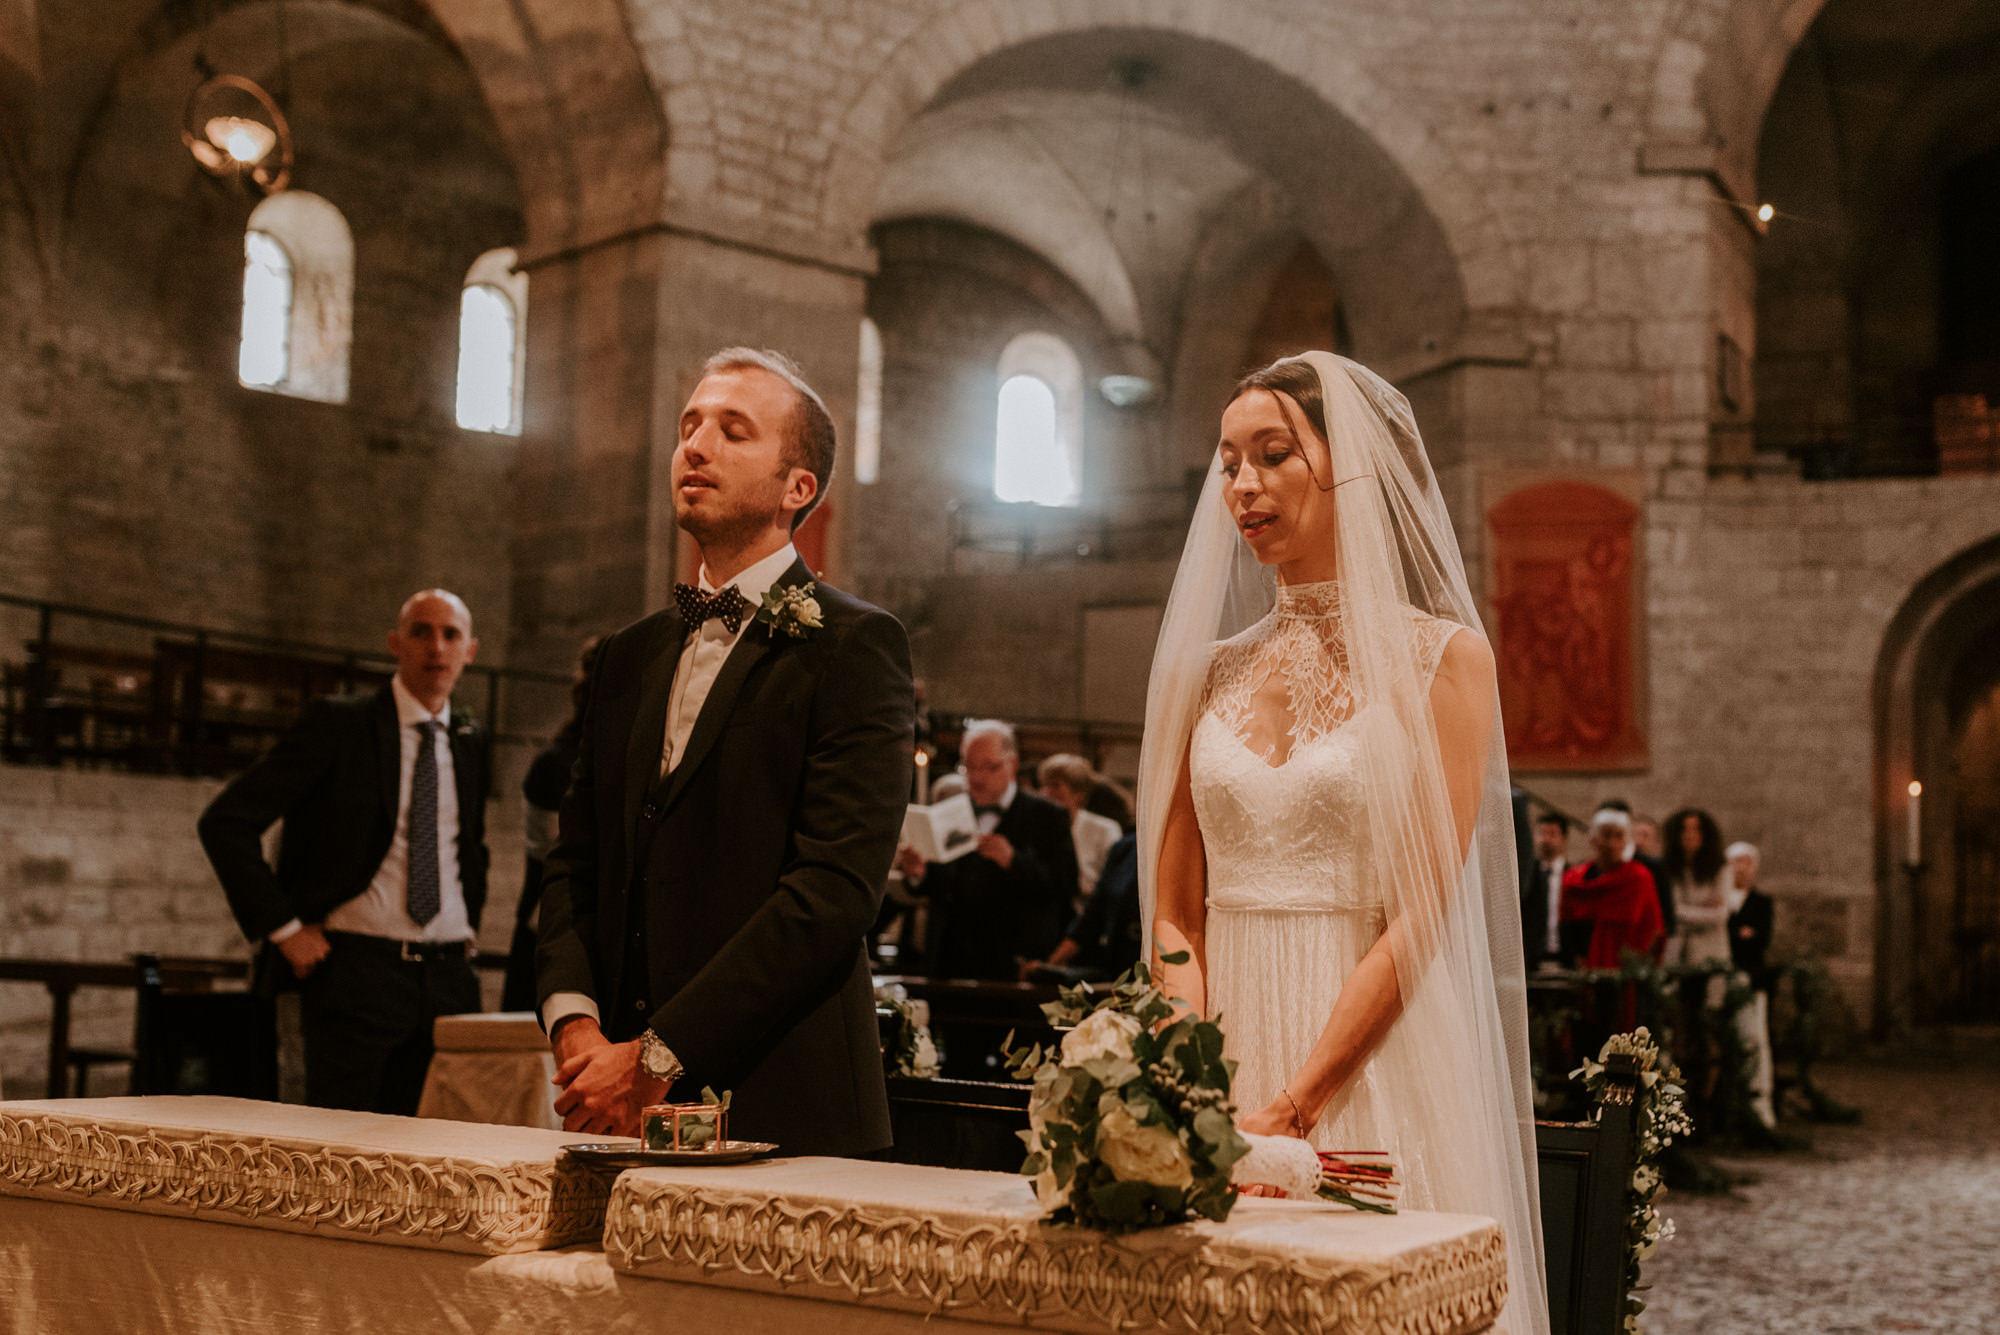 FOTO+PHOTO+BODA+WEDDING+ITALIA+ITALY+MAURICIO+GARAY+MAURICIOGARAY+WEDDINPHOTOGRAPHER+FOTOGRAFODEBODA-815.jpg